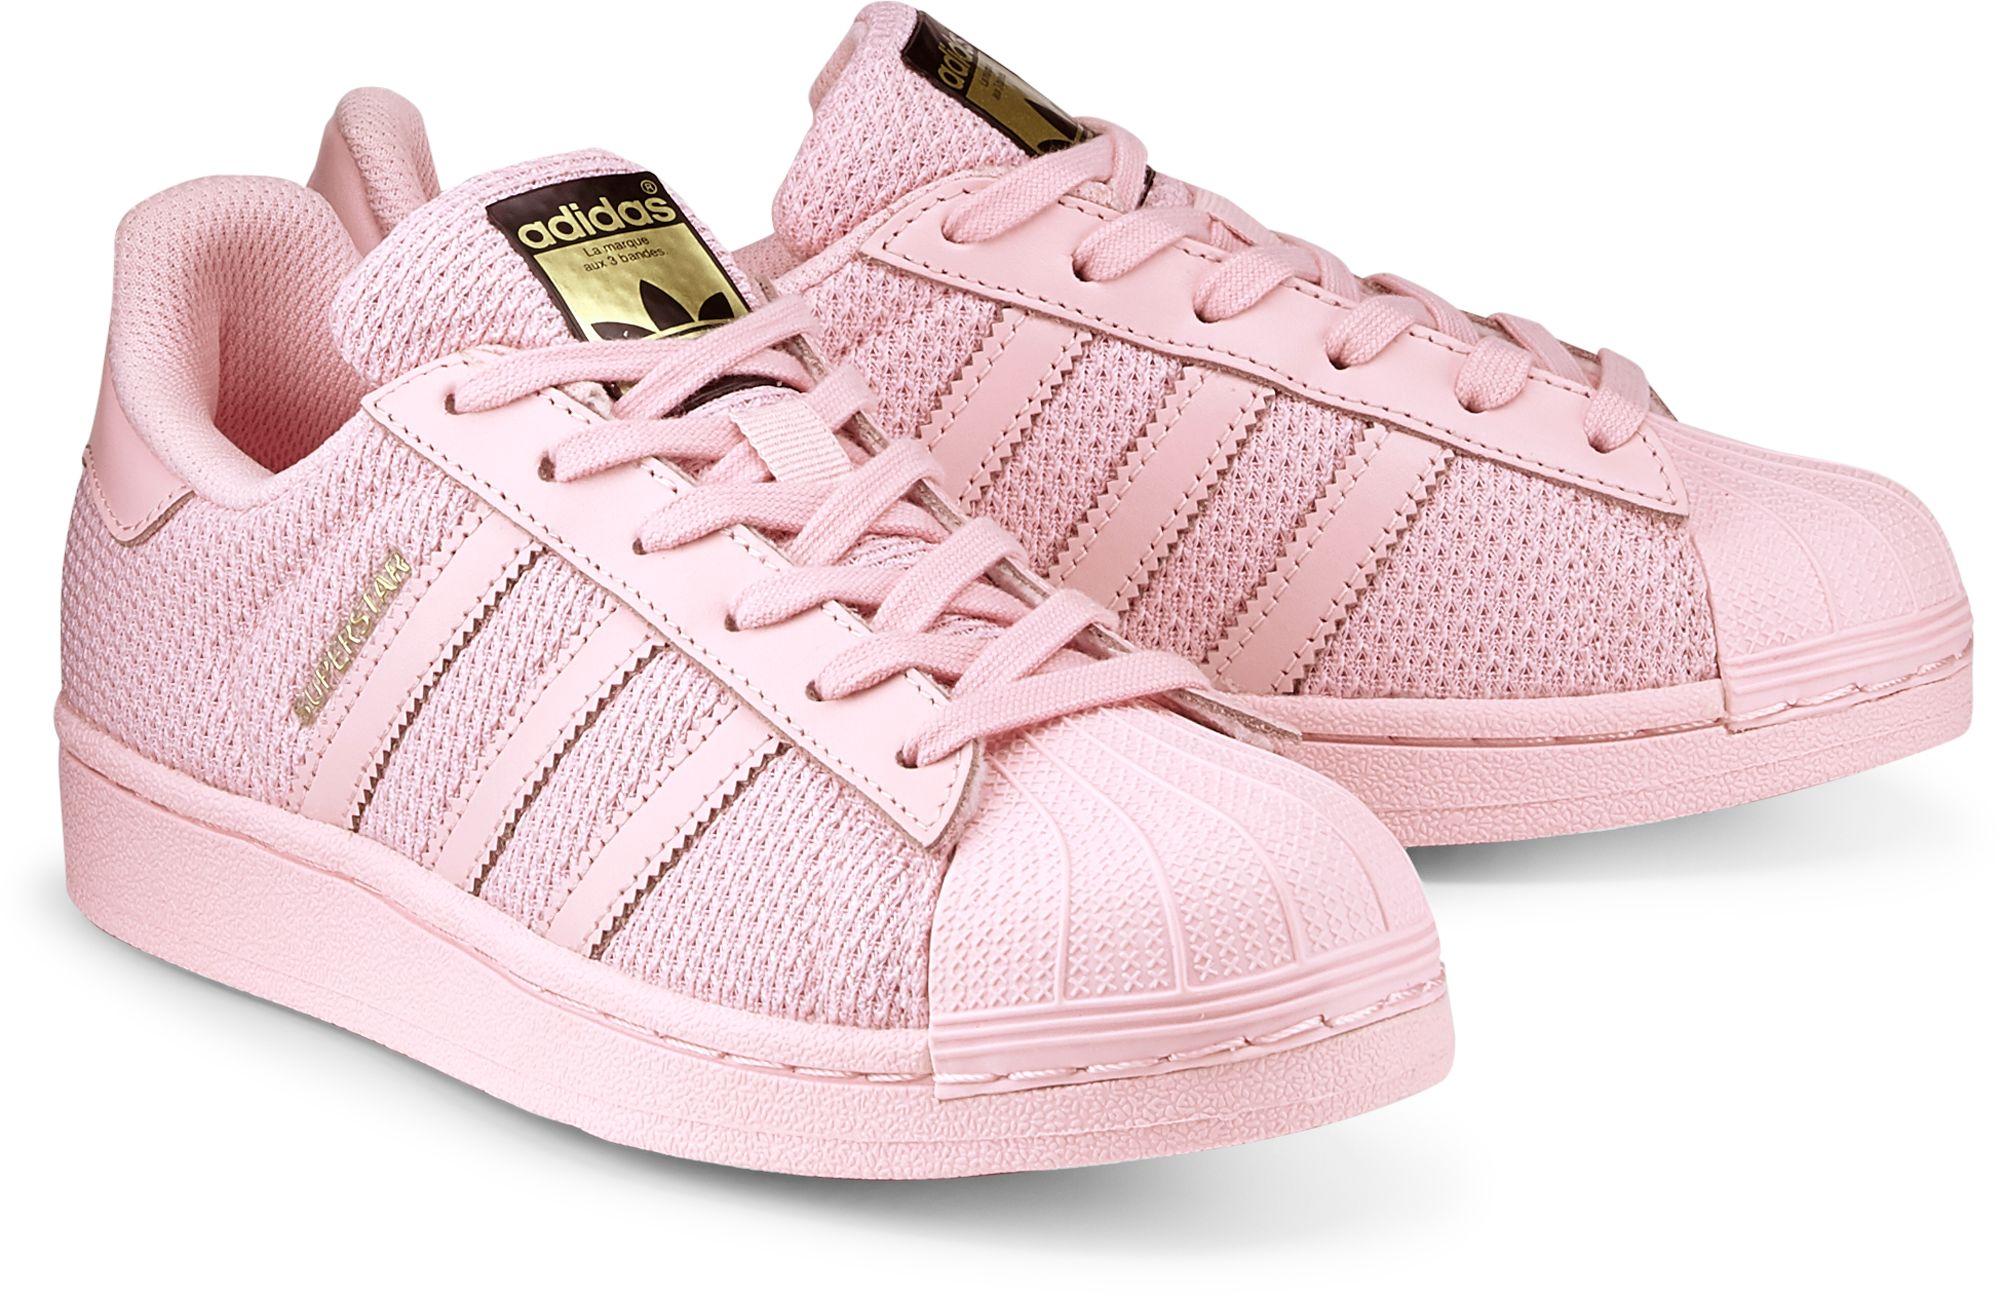 Kinderschuhe für Mädchen | Offizieller adidas Shop